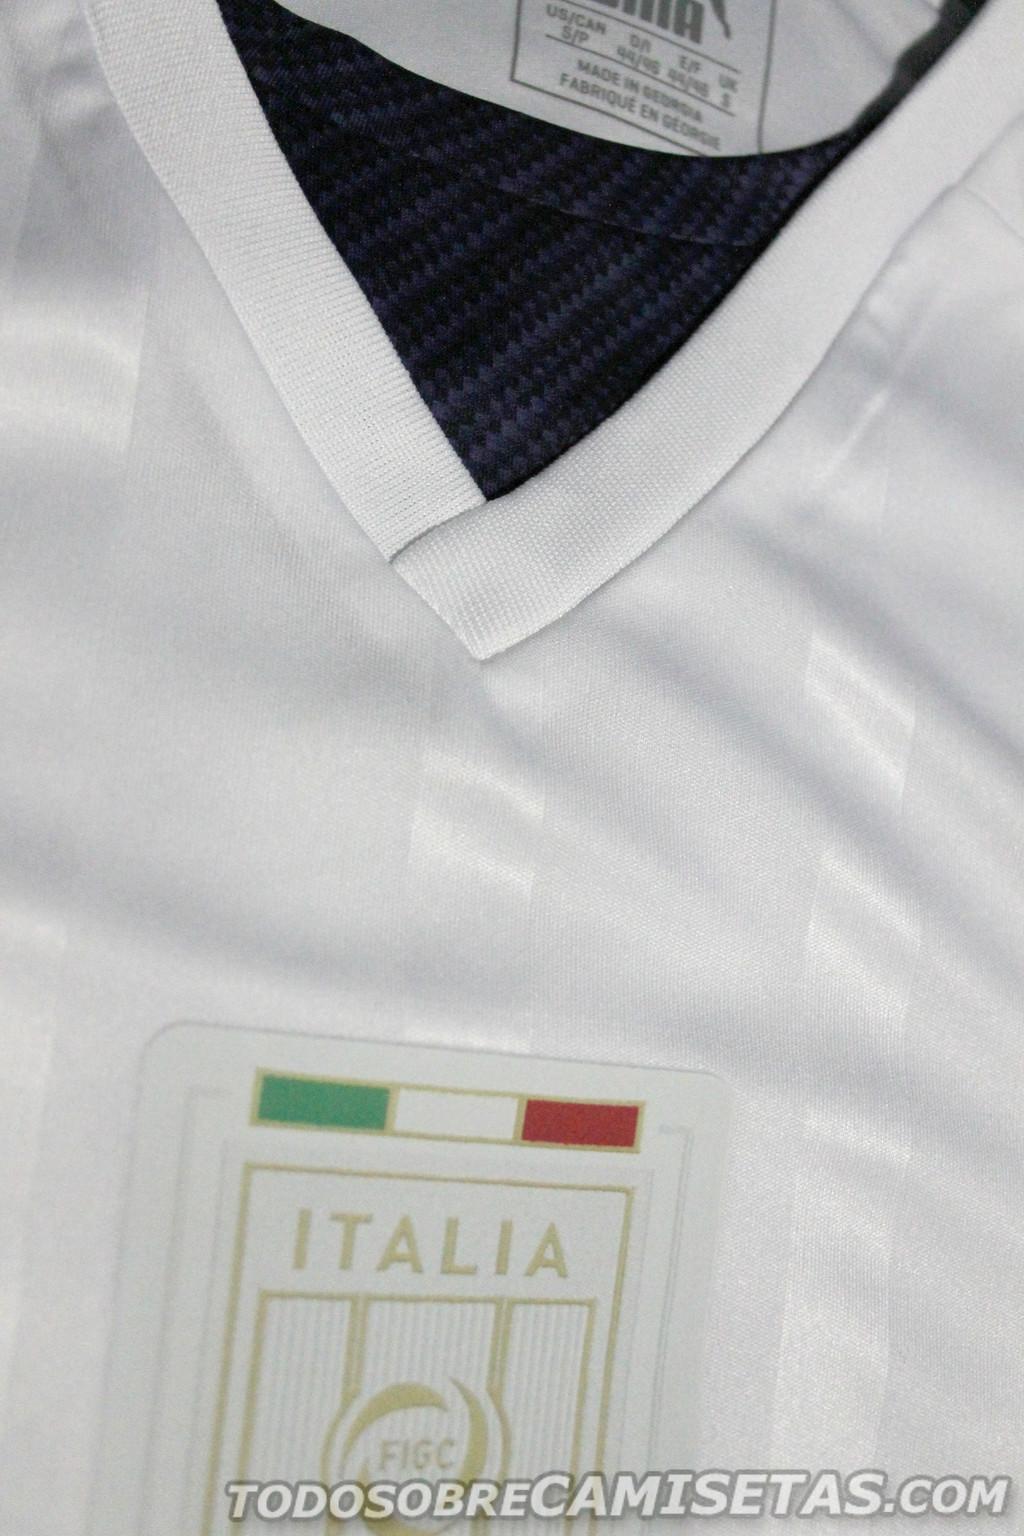 Italy-2016-PUMA-tribute-away-kit-5.jpg